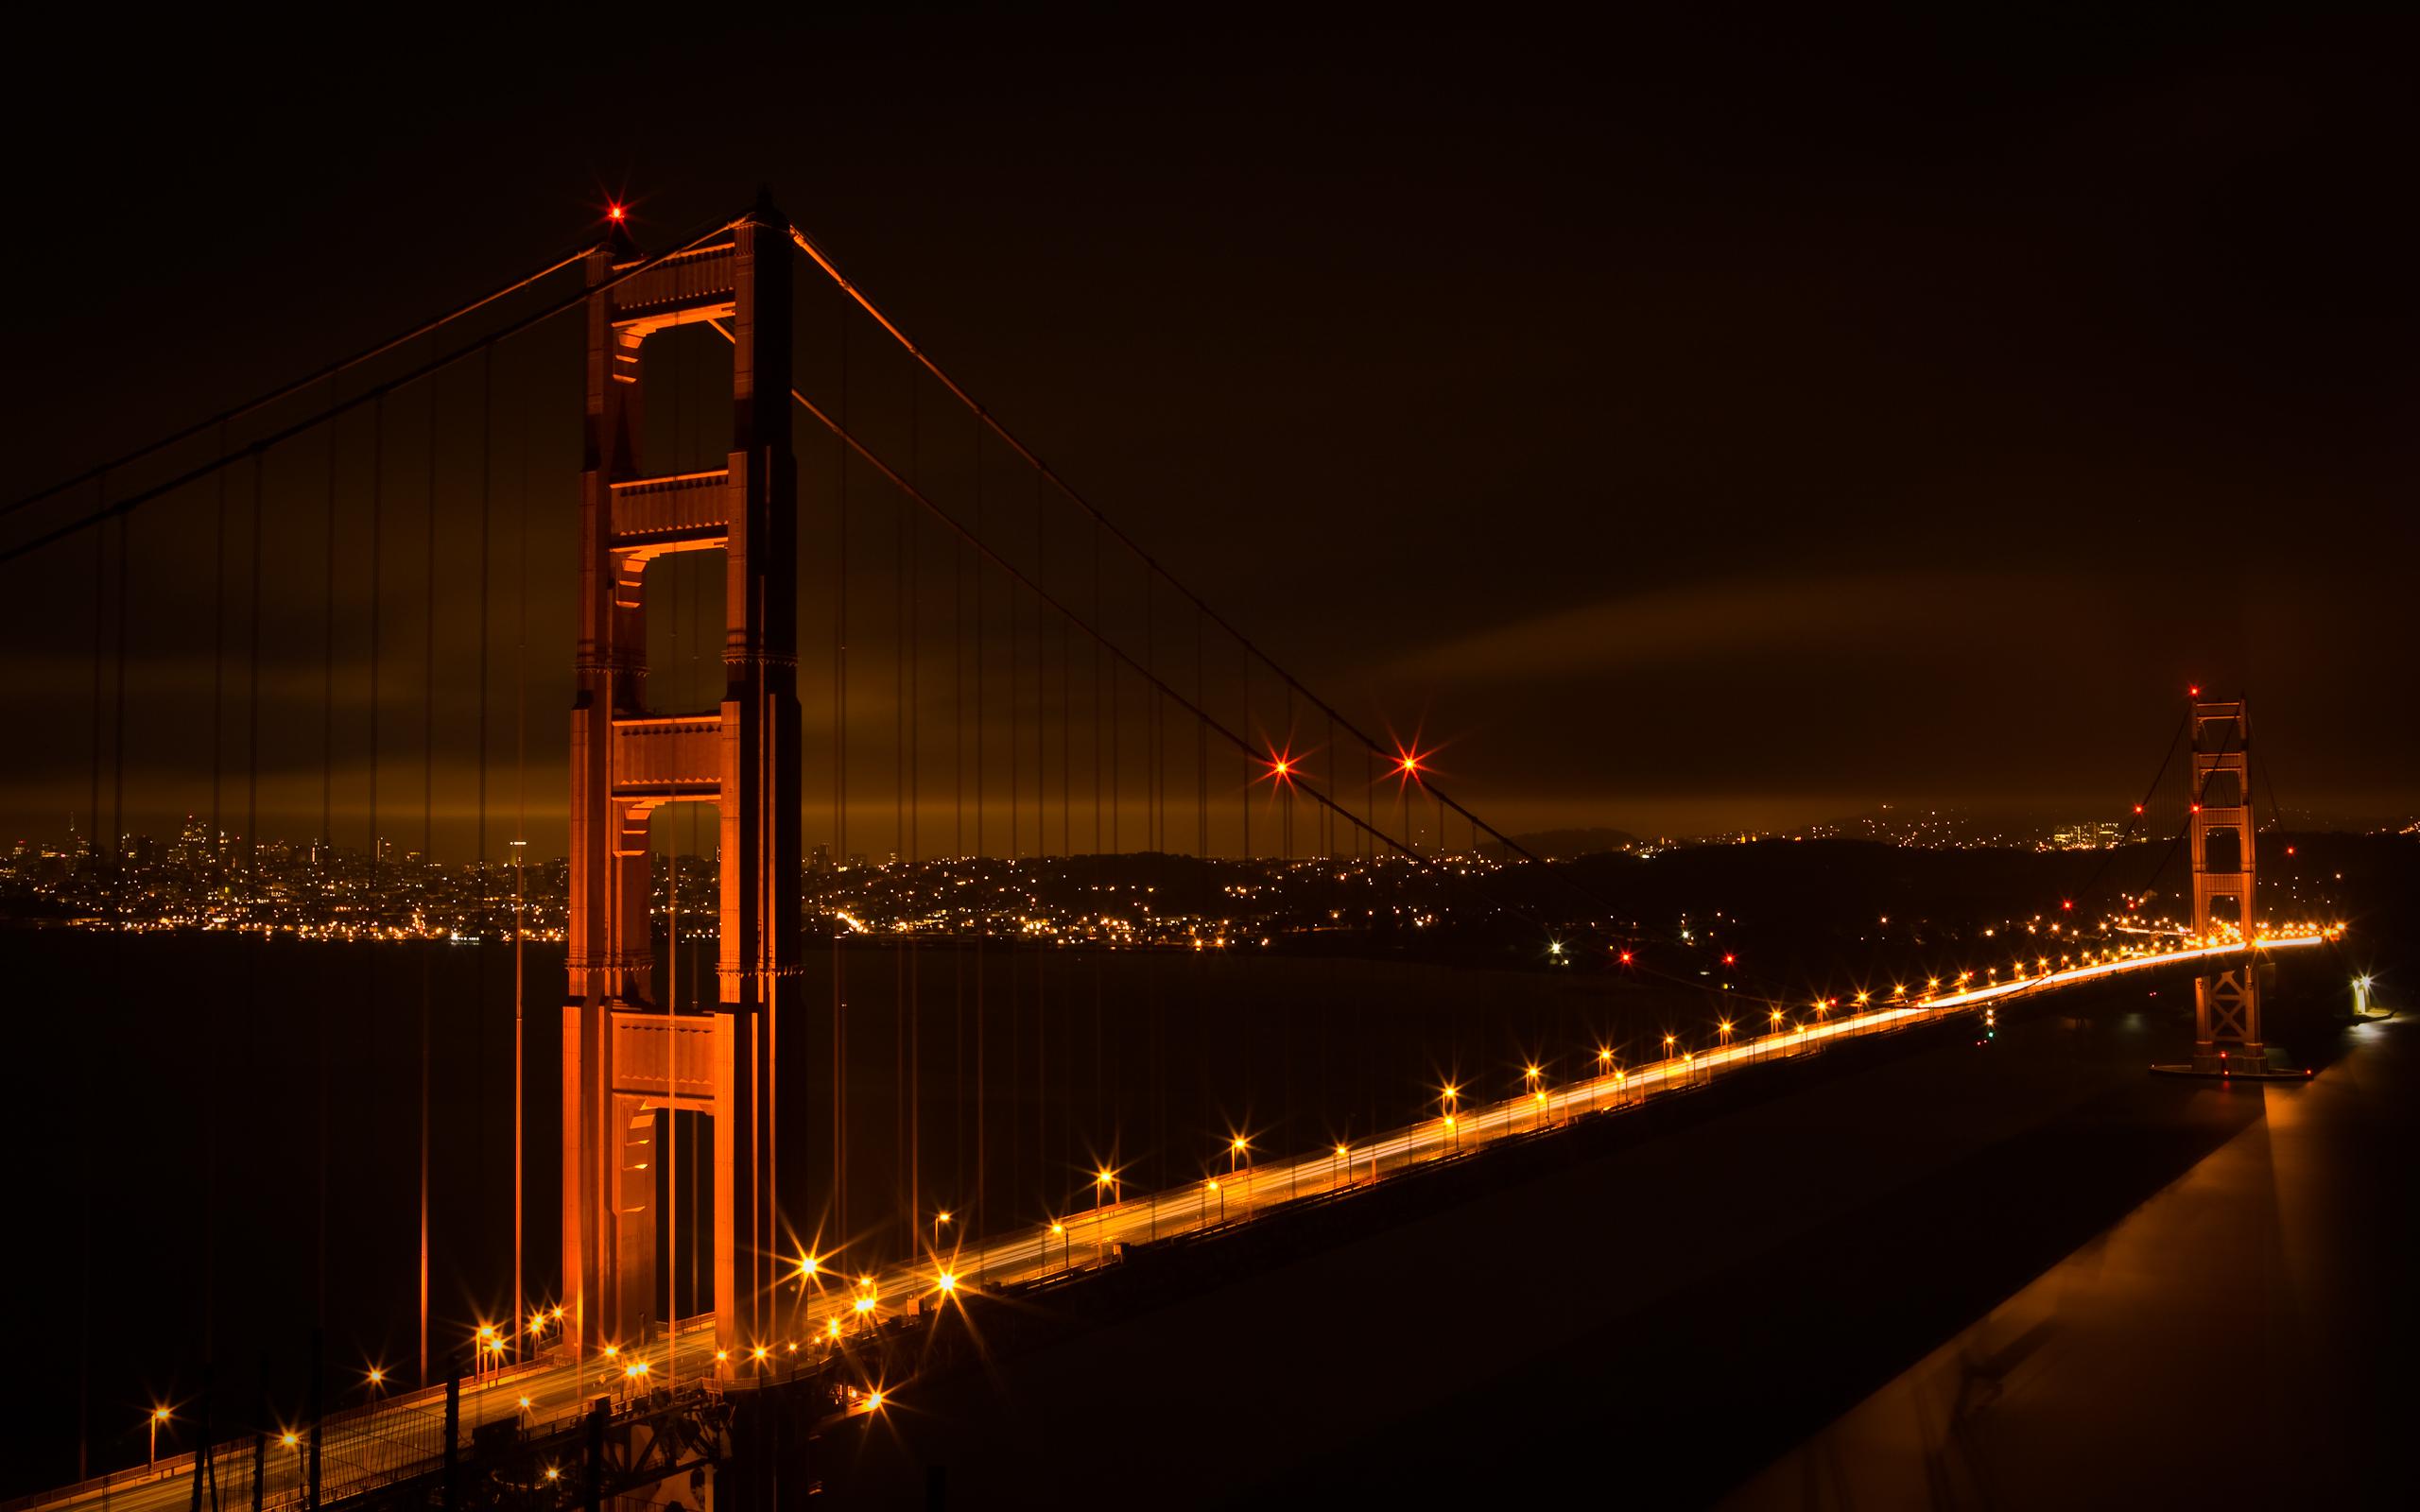 Golden Gate Bridge At Night Hd Wallpaper Wide Screen